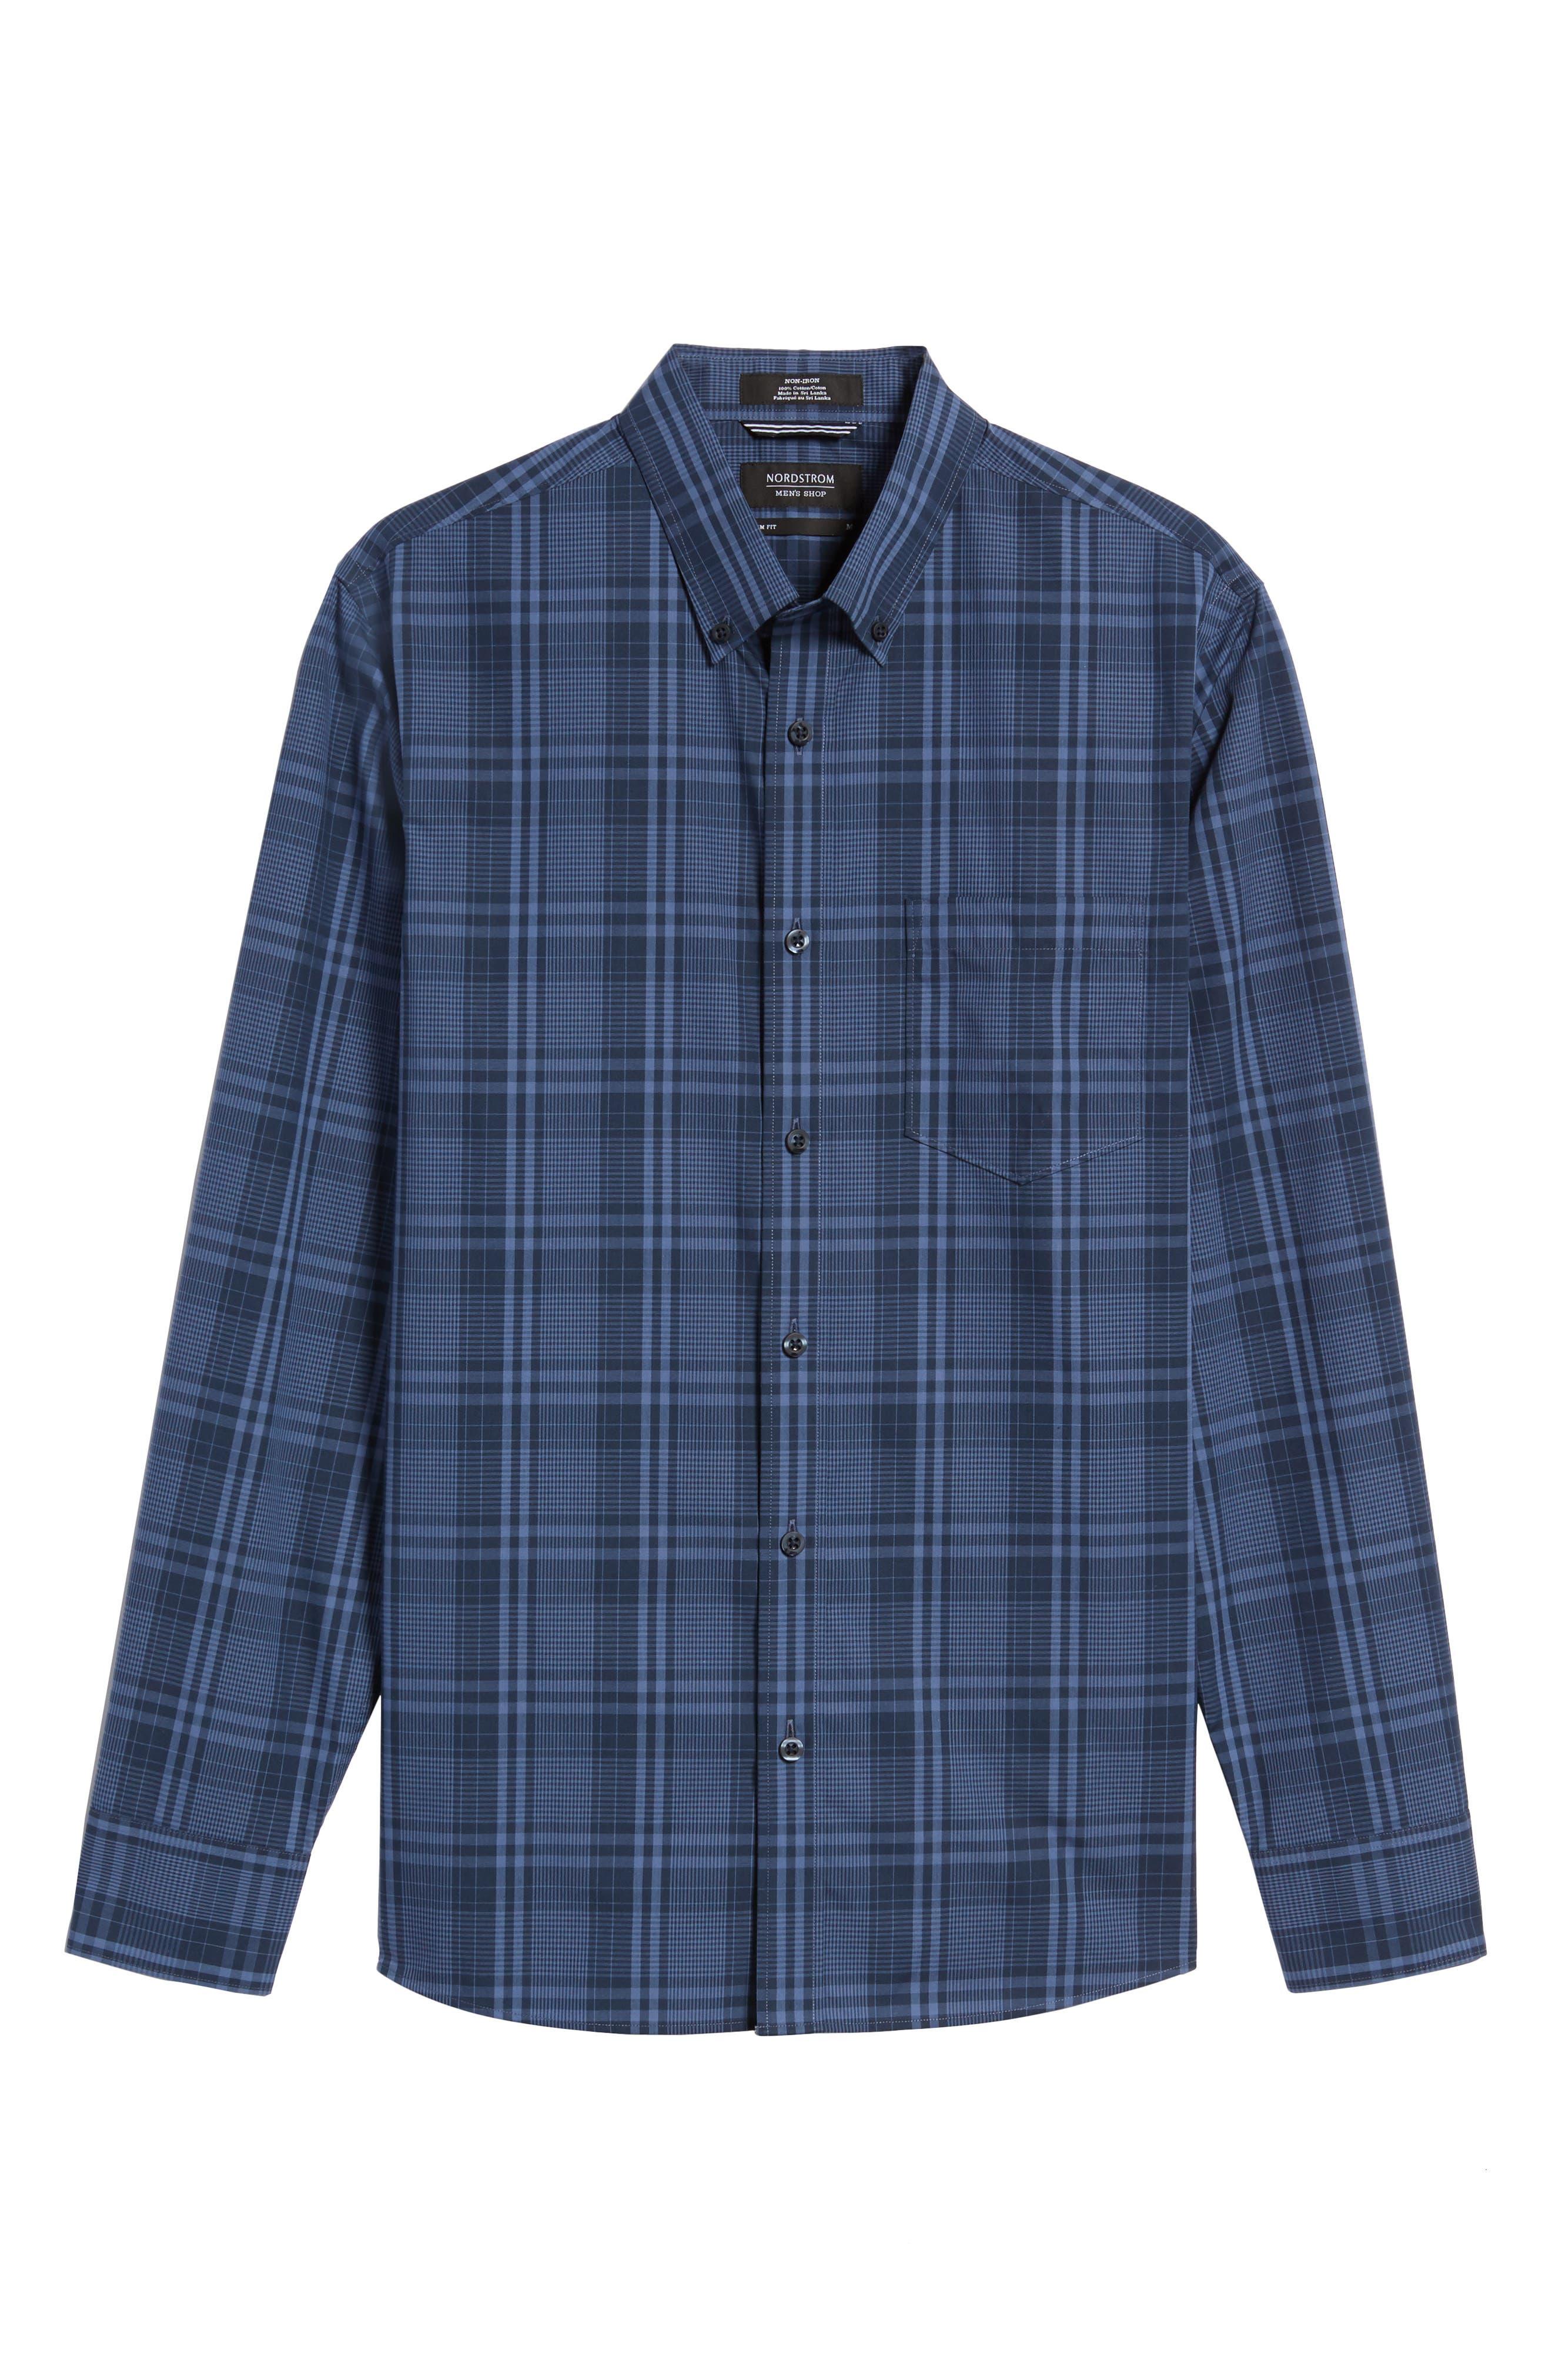 Slim Fit Plaid Sport Shirt,                             Alternate thumbnail 6, color,                             Navy Iris Blue Plaid